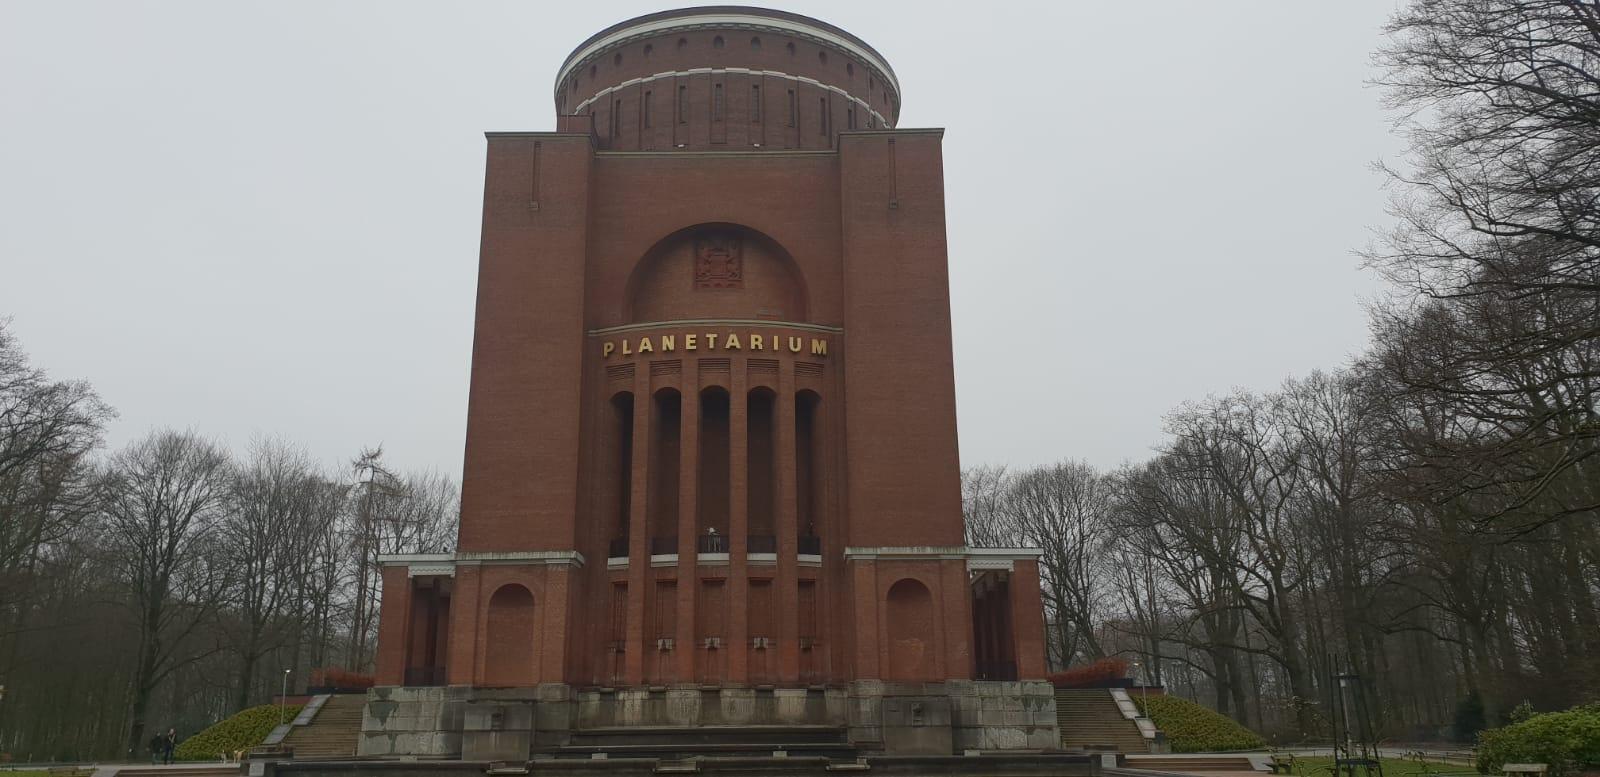 Planetarium im Hamburger Stadtpark